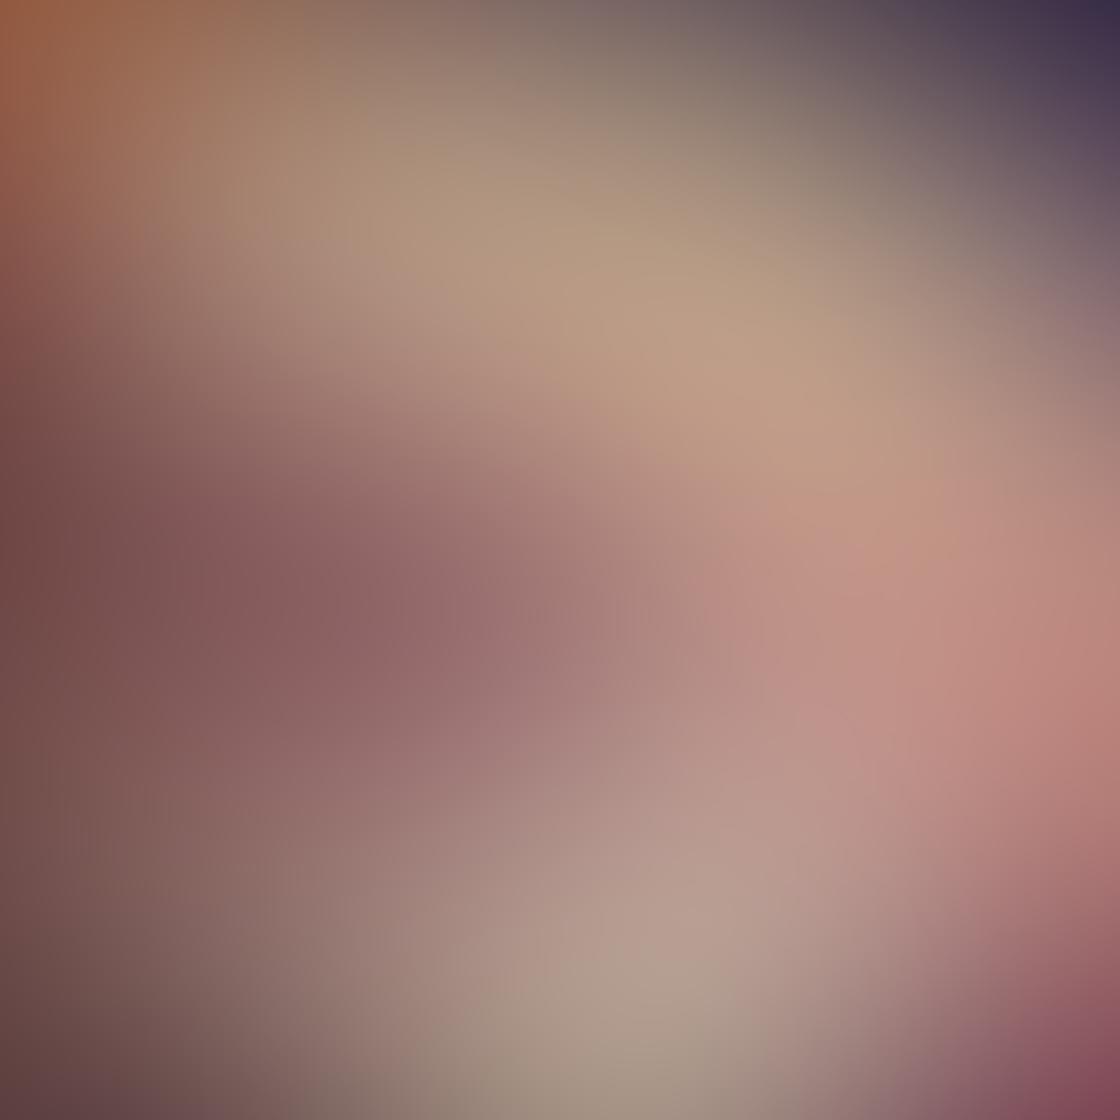 iPhone Photos Editing Styles 23